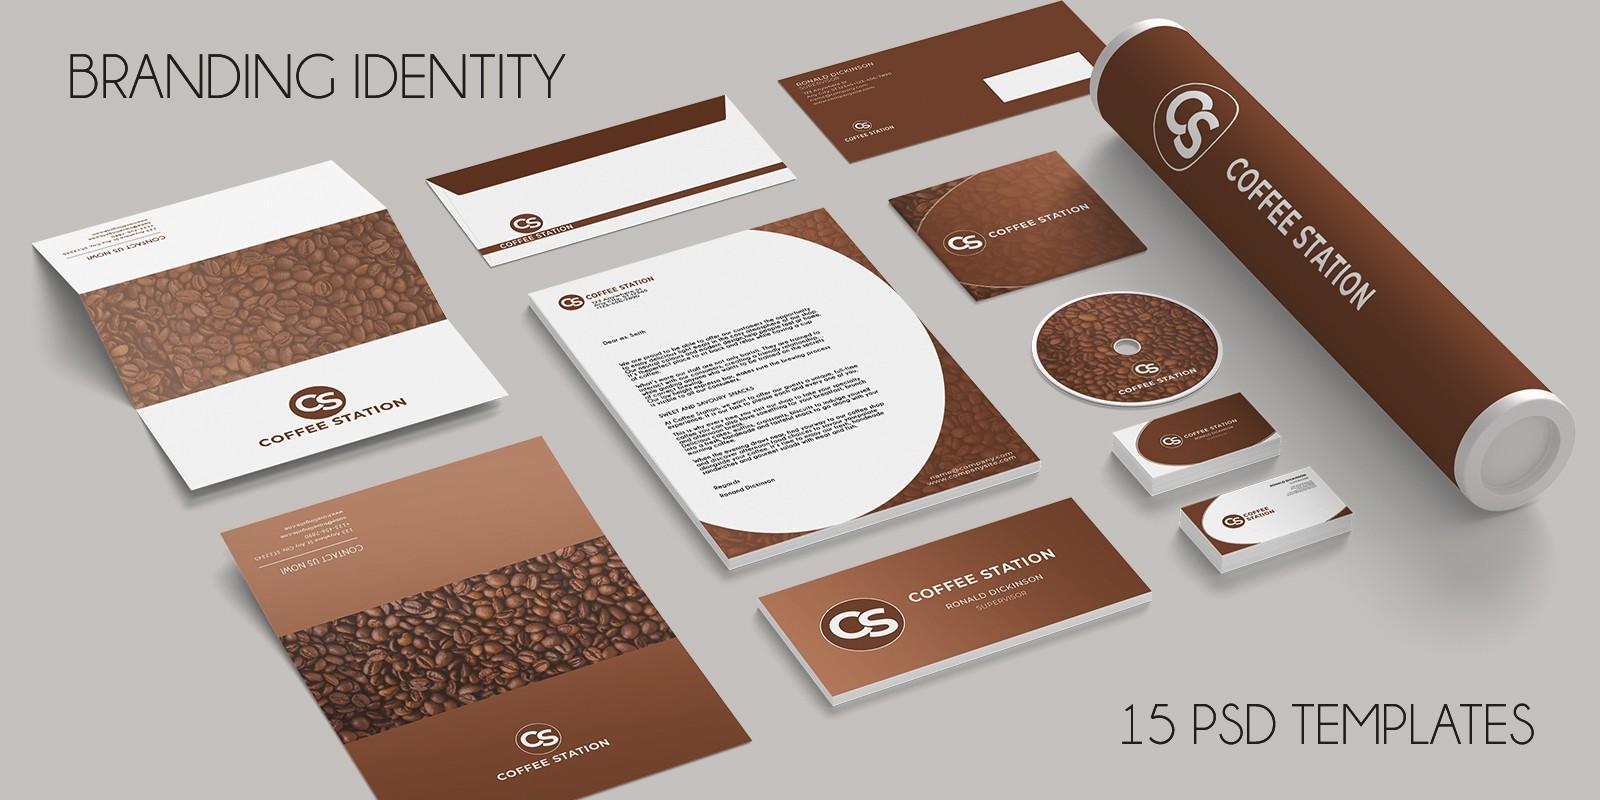 Branding Identity - 15 PSD Templates